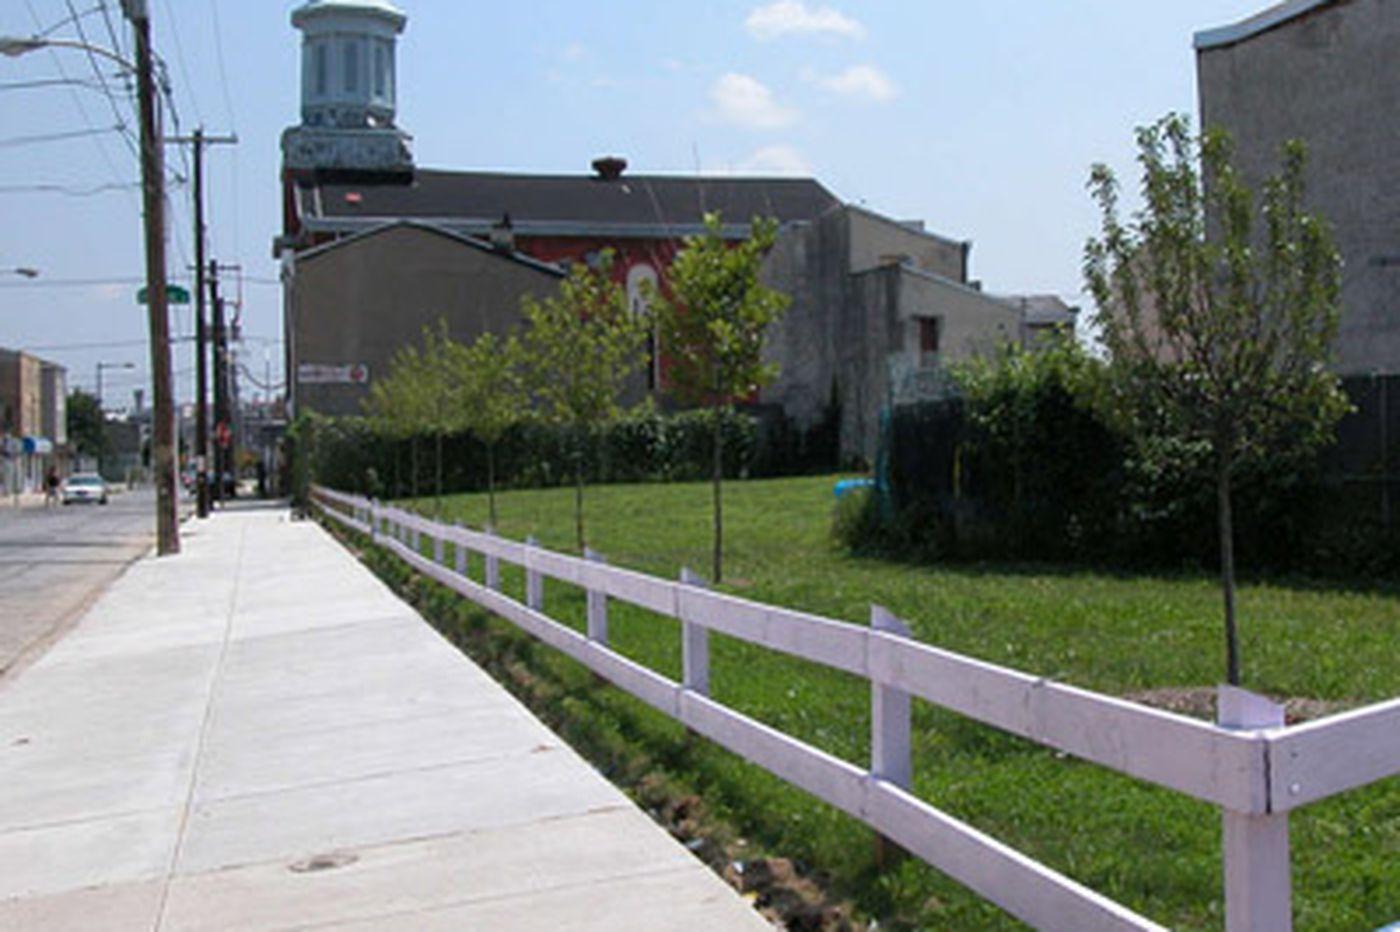 University of Pennsylvania study links vacant-lot cleanups, reduced gun crime